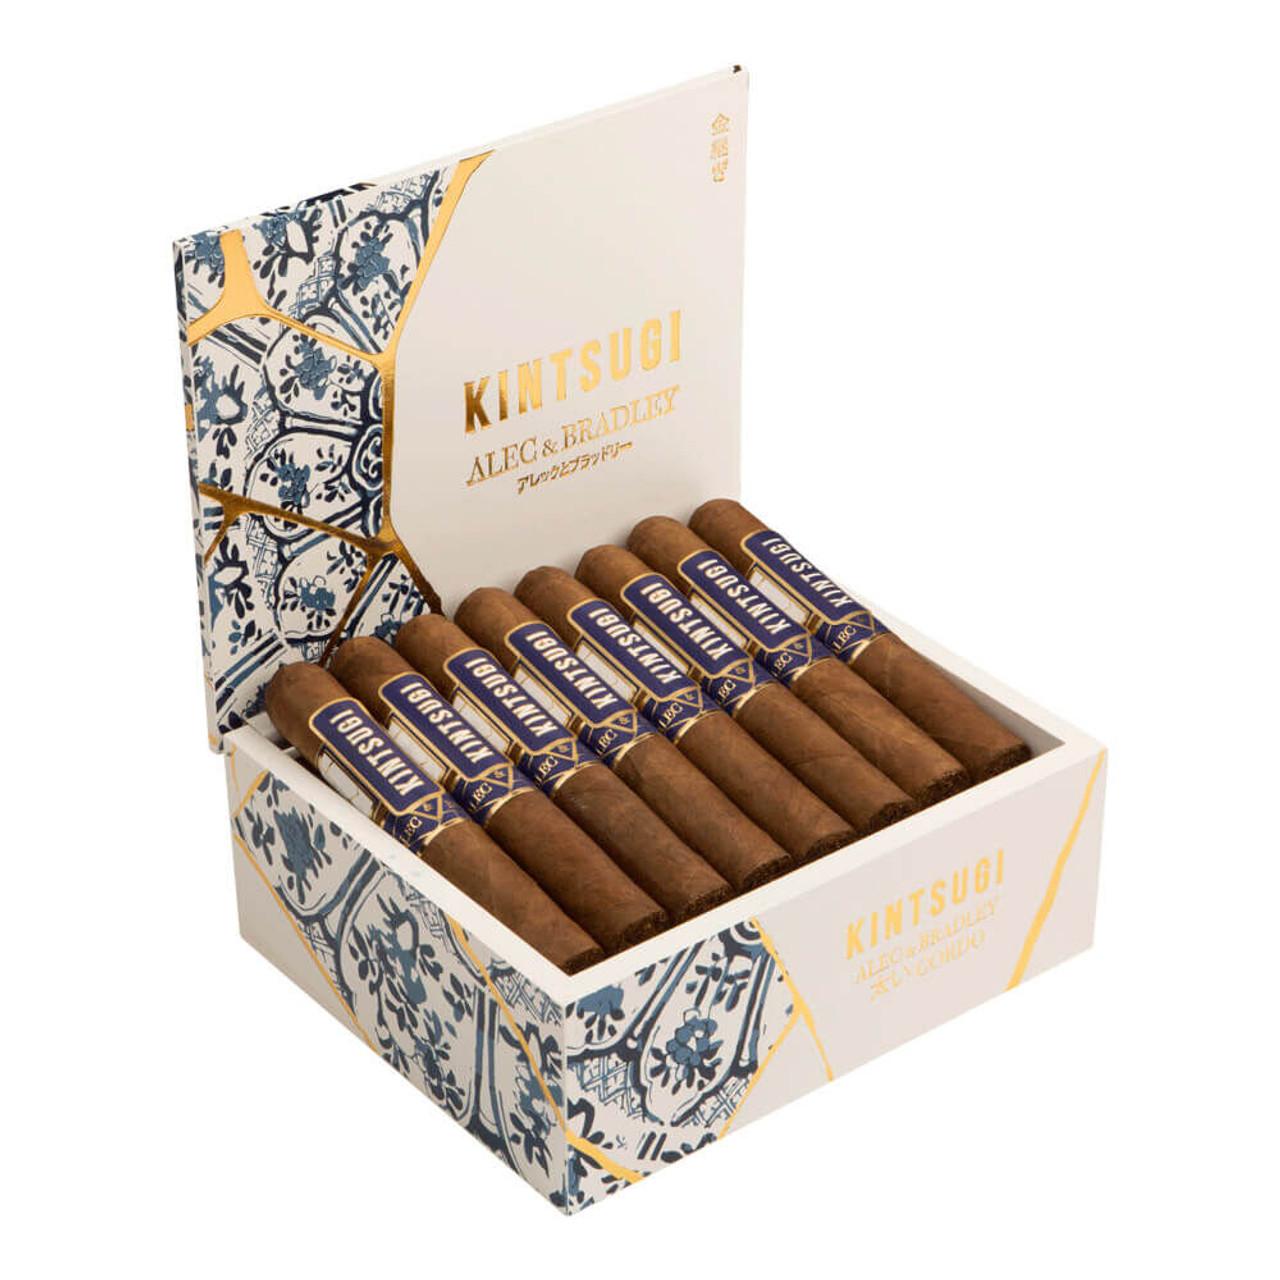 Alec & Bradley Kintsugi Gordo Cigars - 6.0 x 60 (Box of 24)